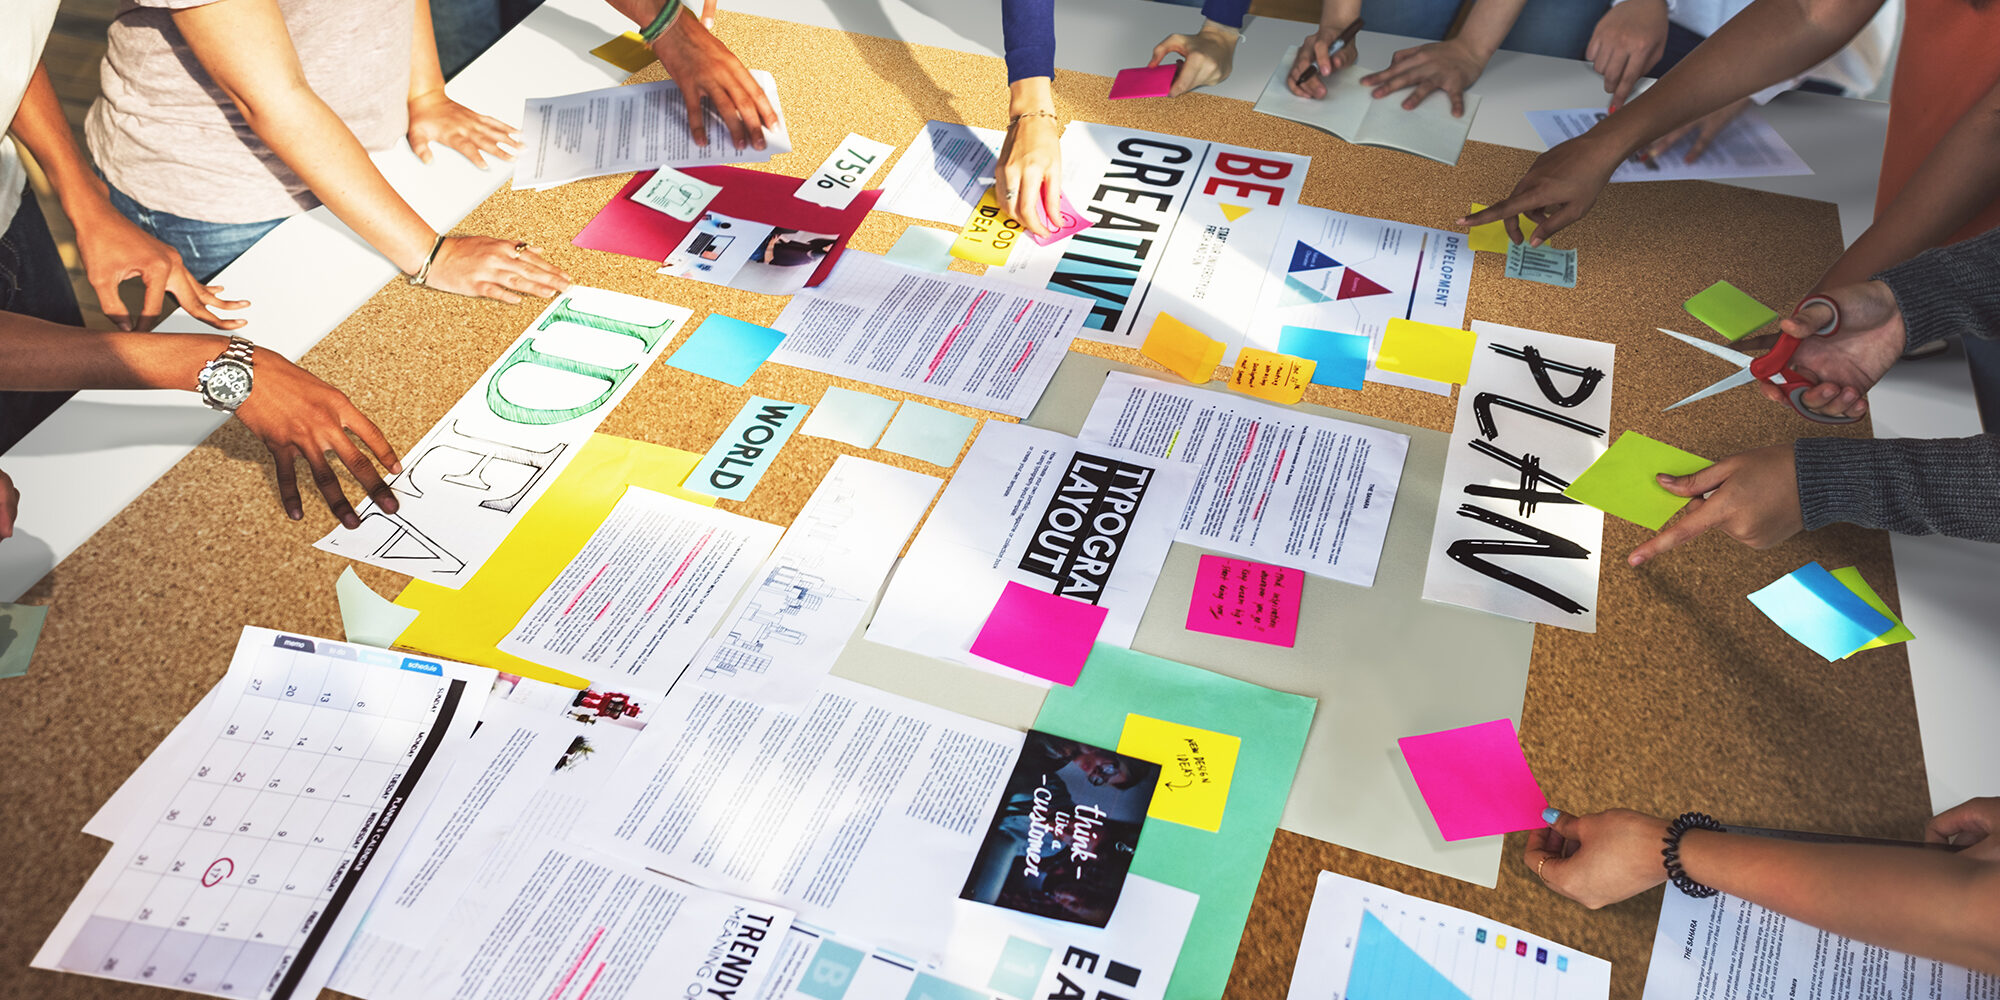 Key Design & Media's Creative Director Keisha Pyzynski On How Brands Get The Most Bang For Their Design Bucks